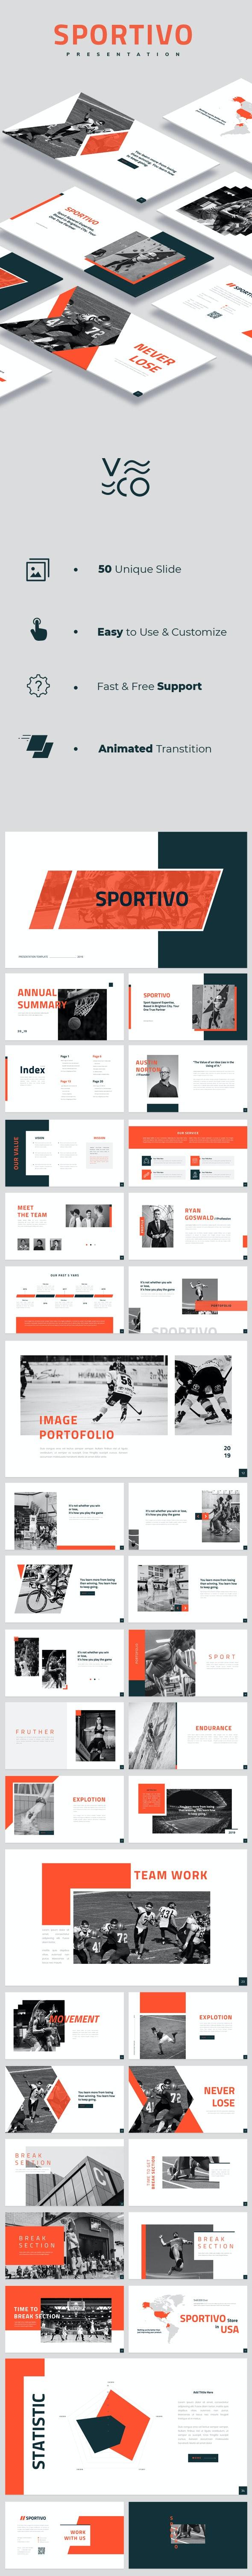 Sportivo Powerpoint - PowerPoint Templates Presentation Templates